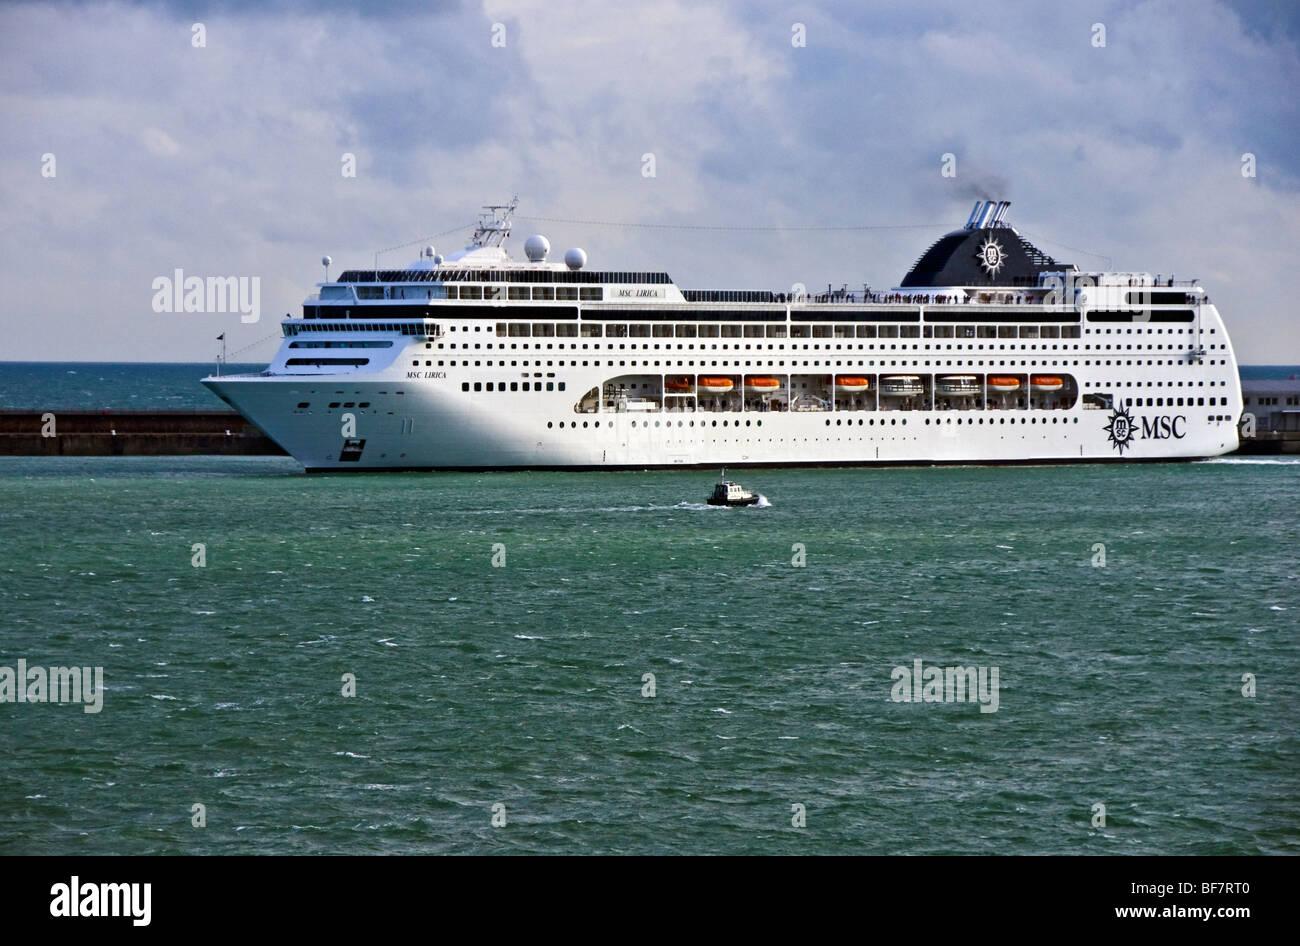 MSC Cruises cruise ship MSC Lirica departs Dover in England - Stock Image